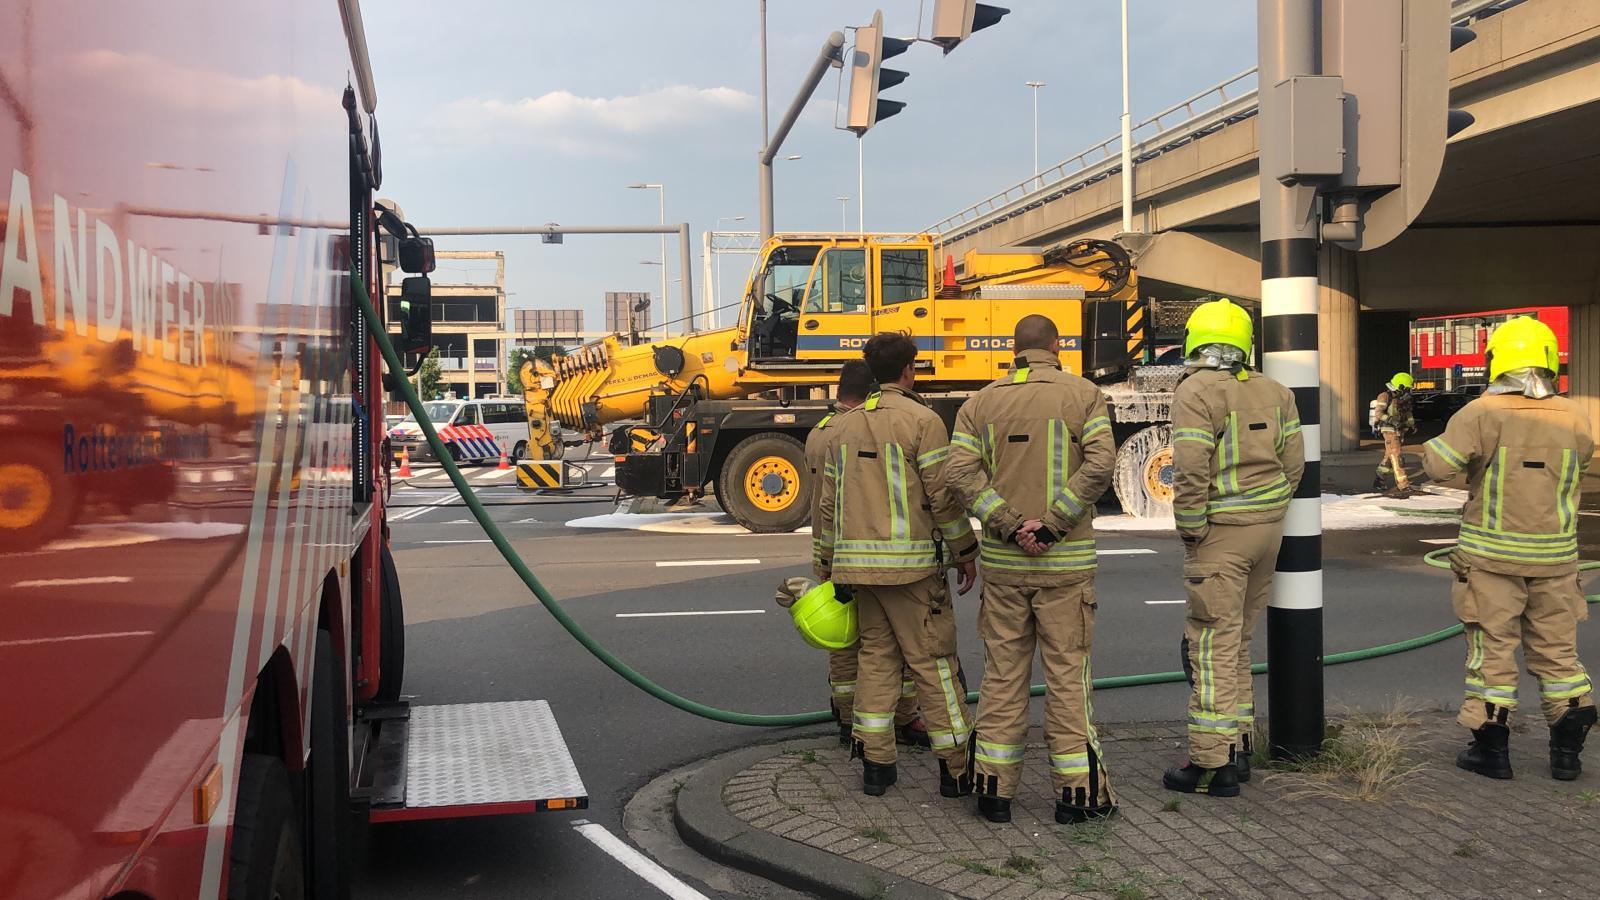 Brand in hijskraan snel geblust Giessenweg Rotterdam